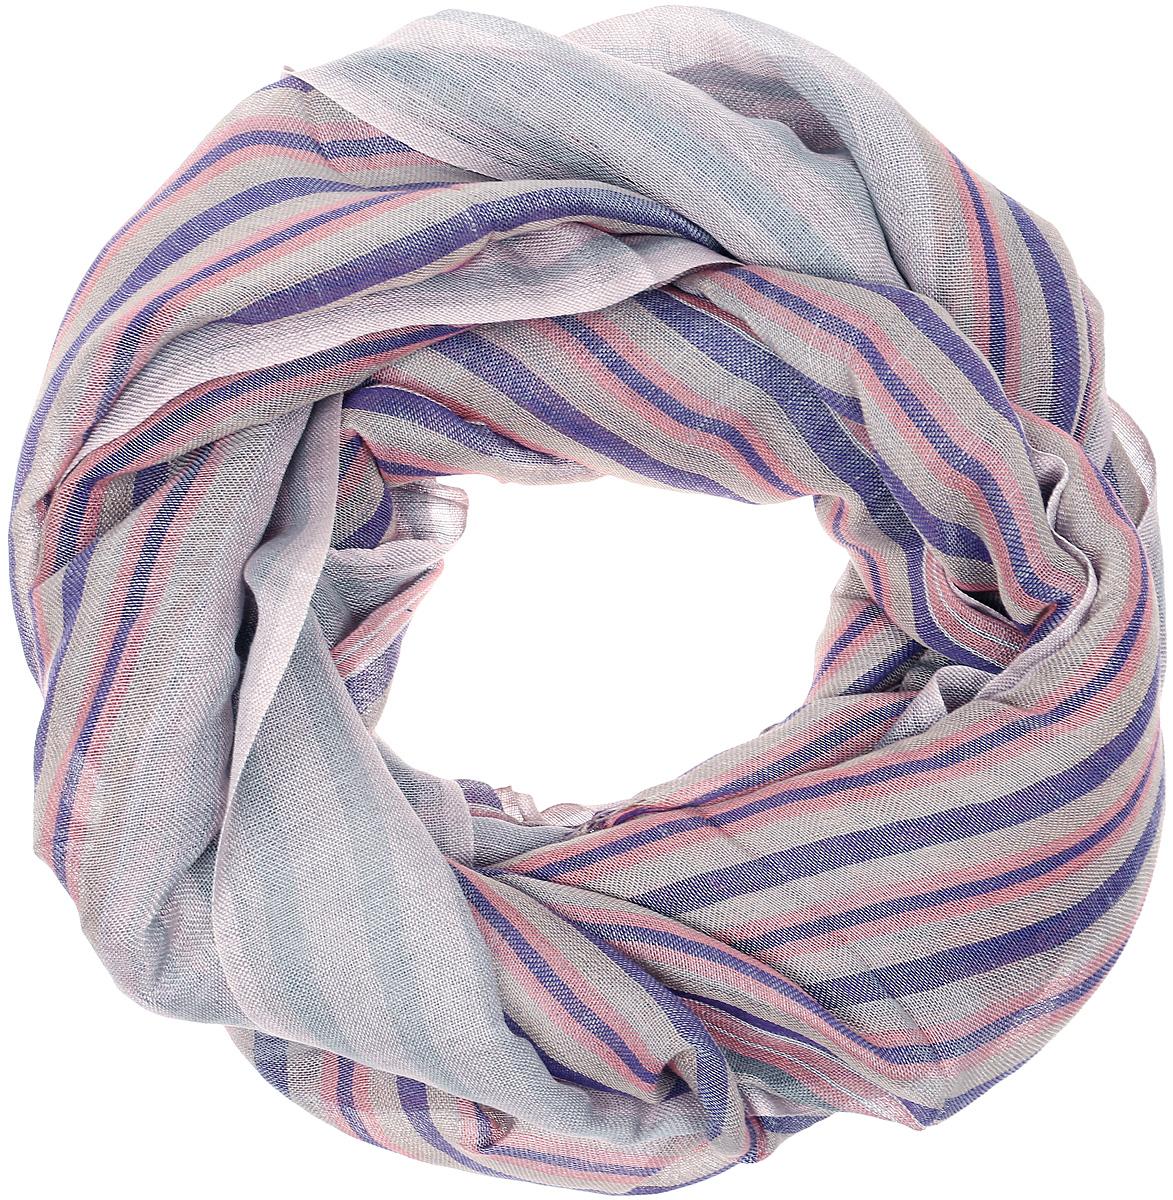 Шарф Henry Backer шарф женский henry backer цвет розовый hb1605b14 63 размер 100 см х 200 см